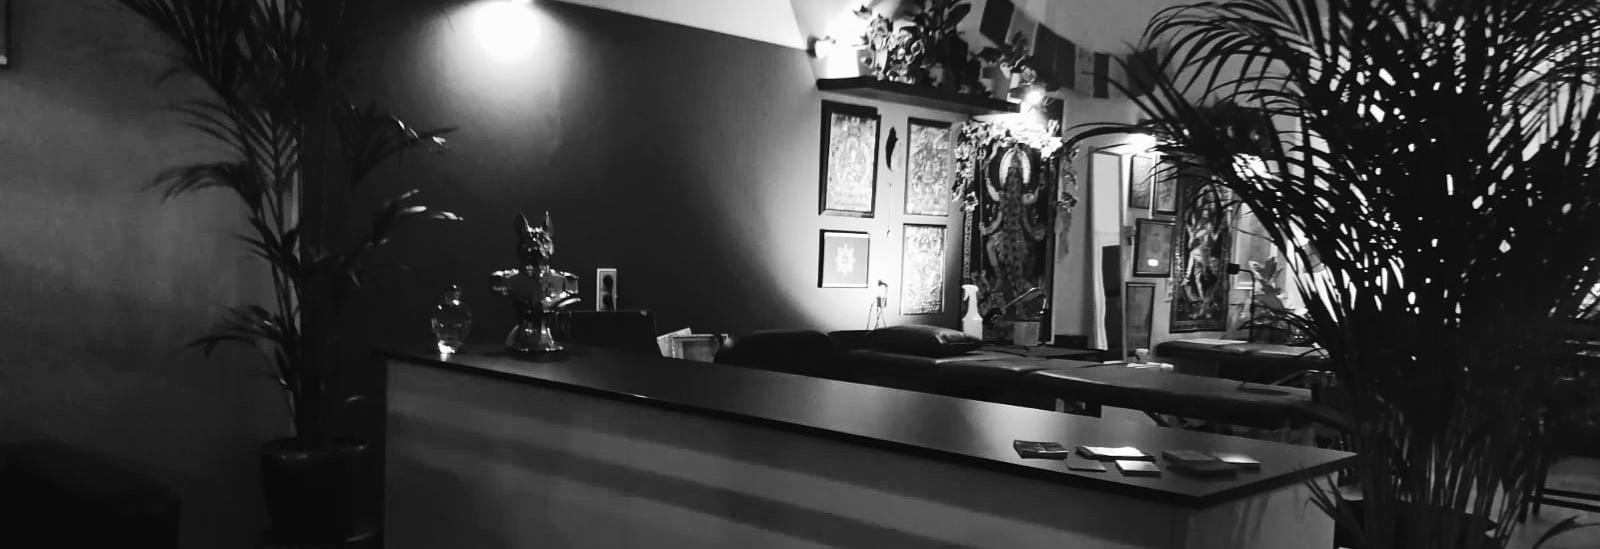 Tattoo Studio Ad Infinitum aus Bochum Ehrenfeld